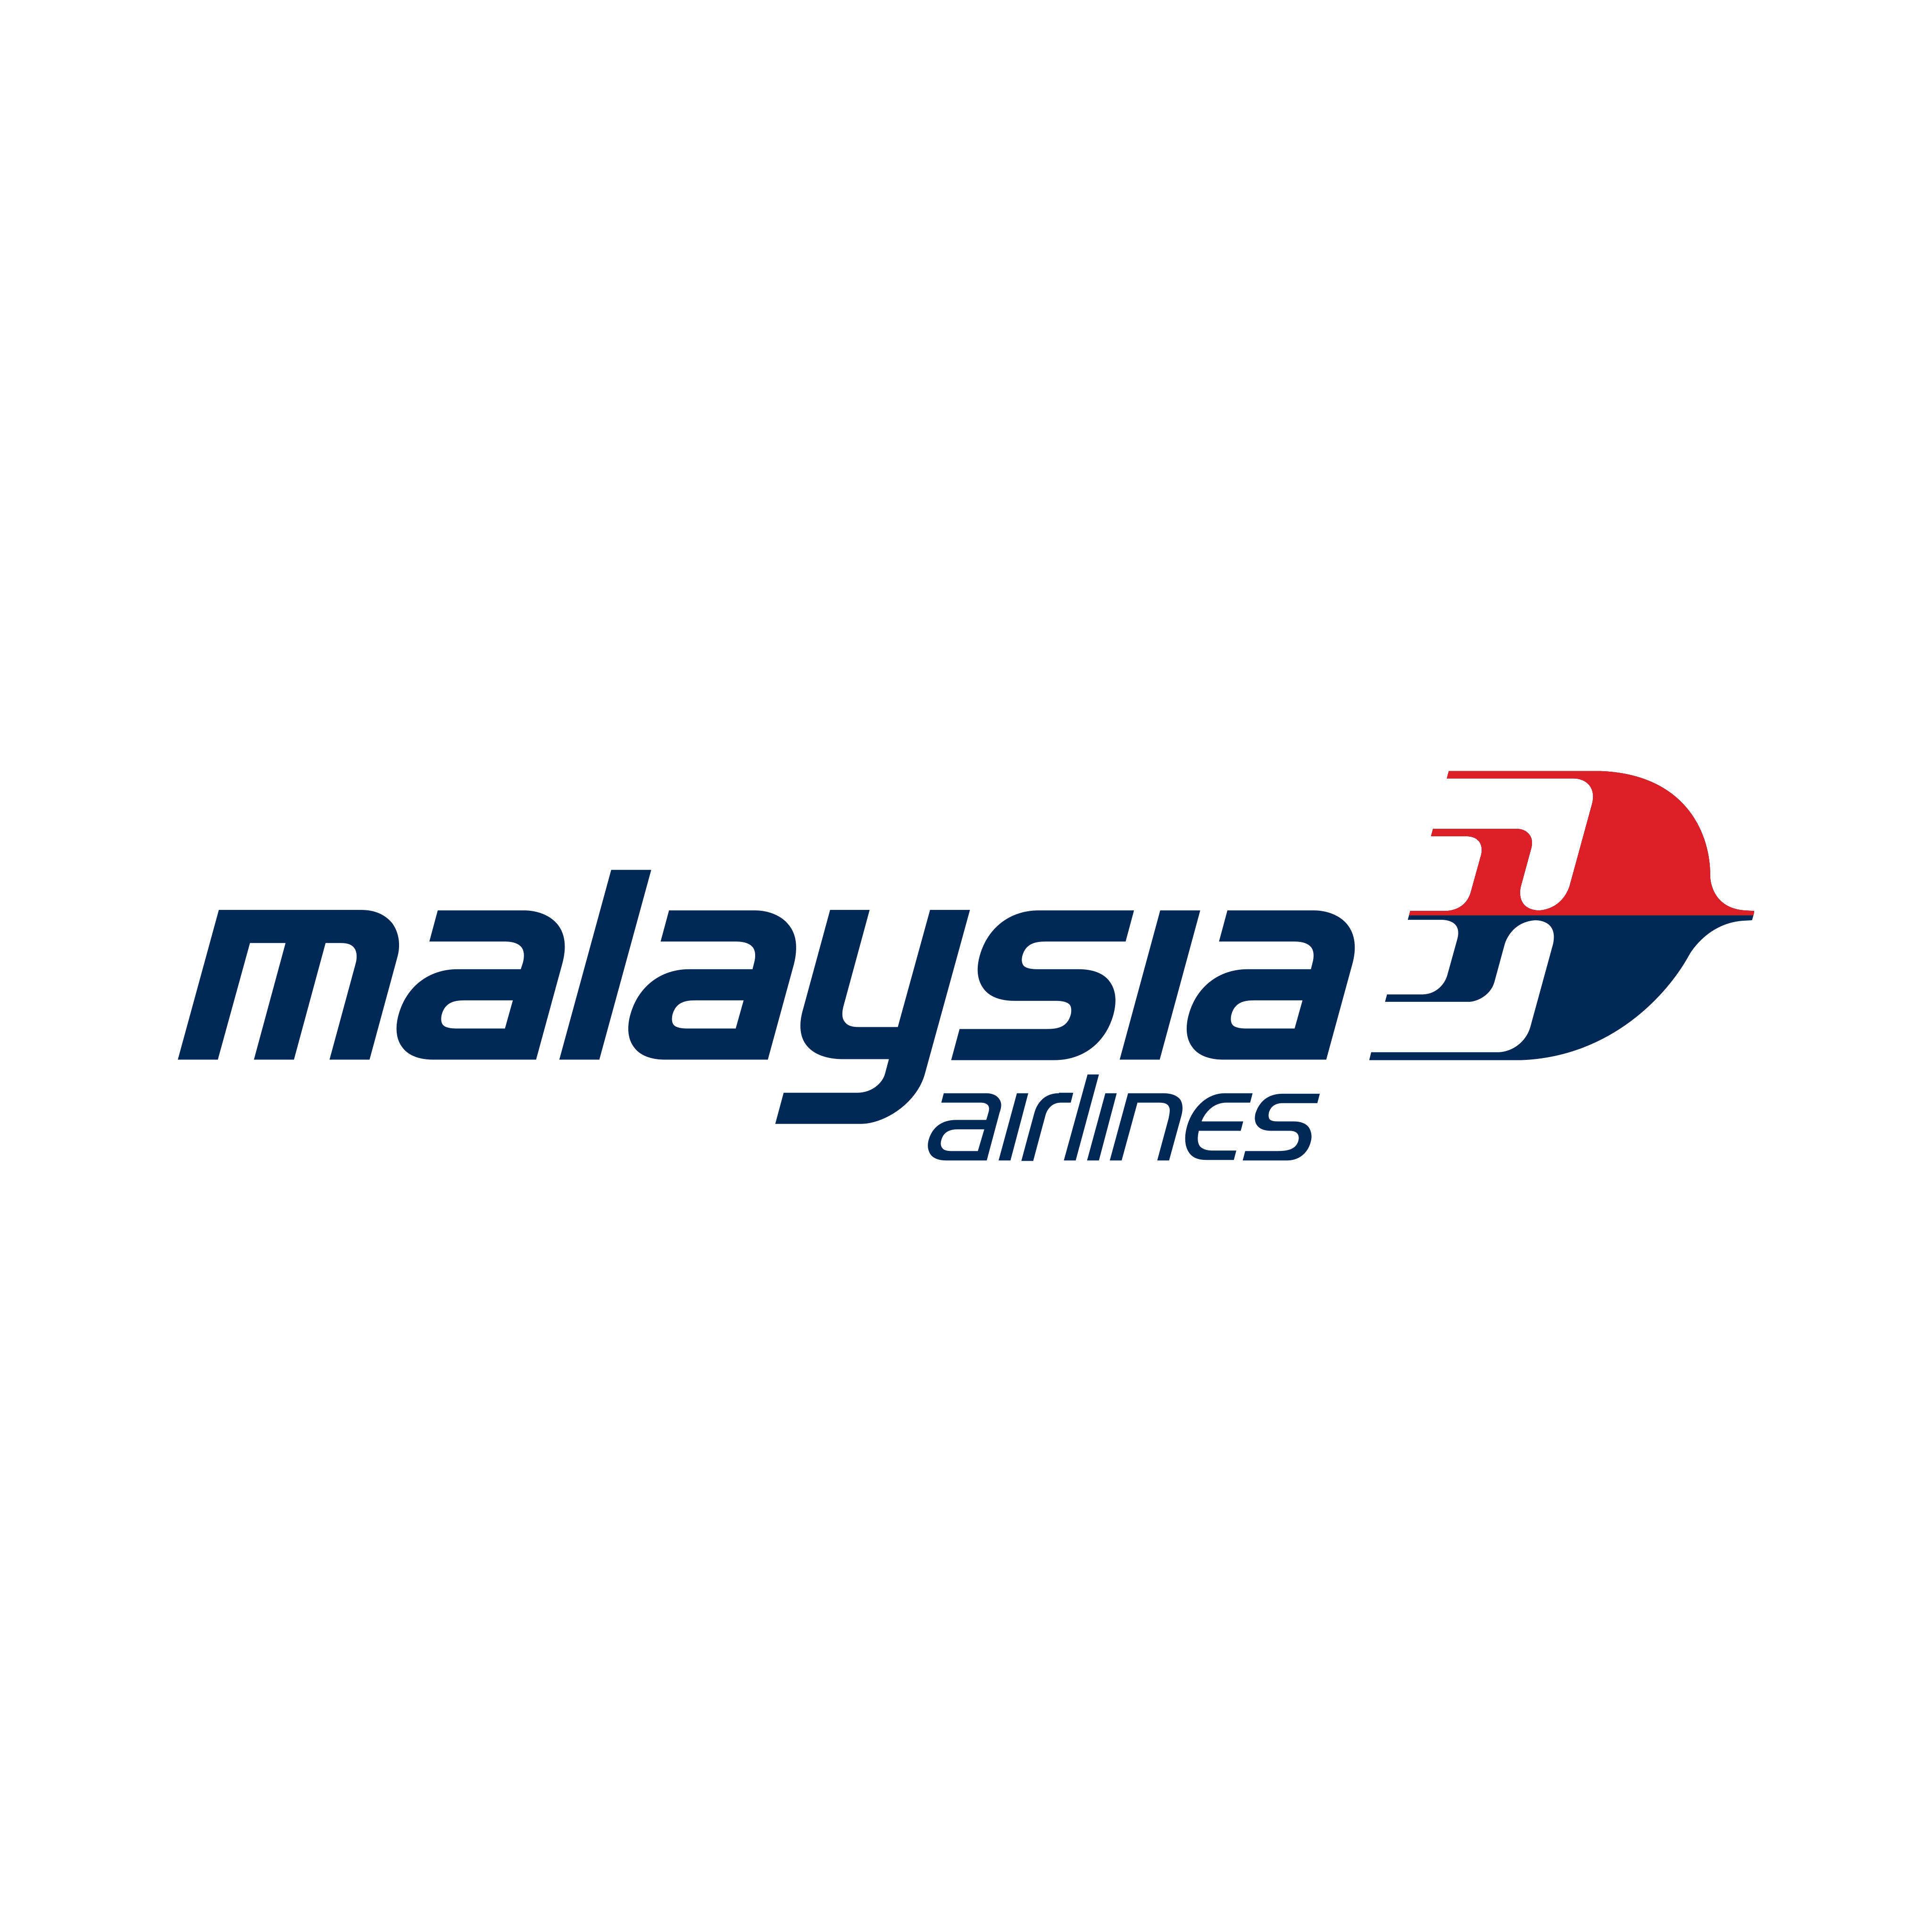 malaysia airlines logo 0 - Malaysia Airlines Logo